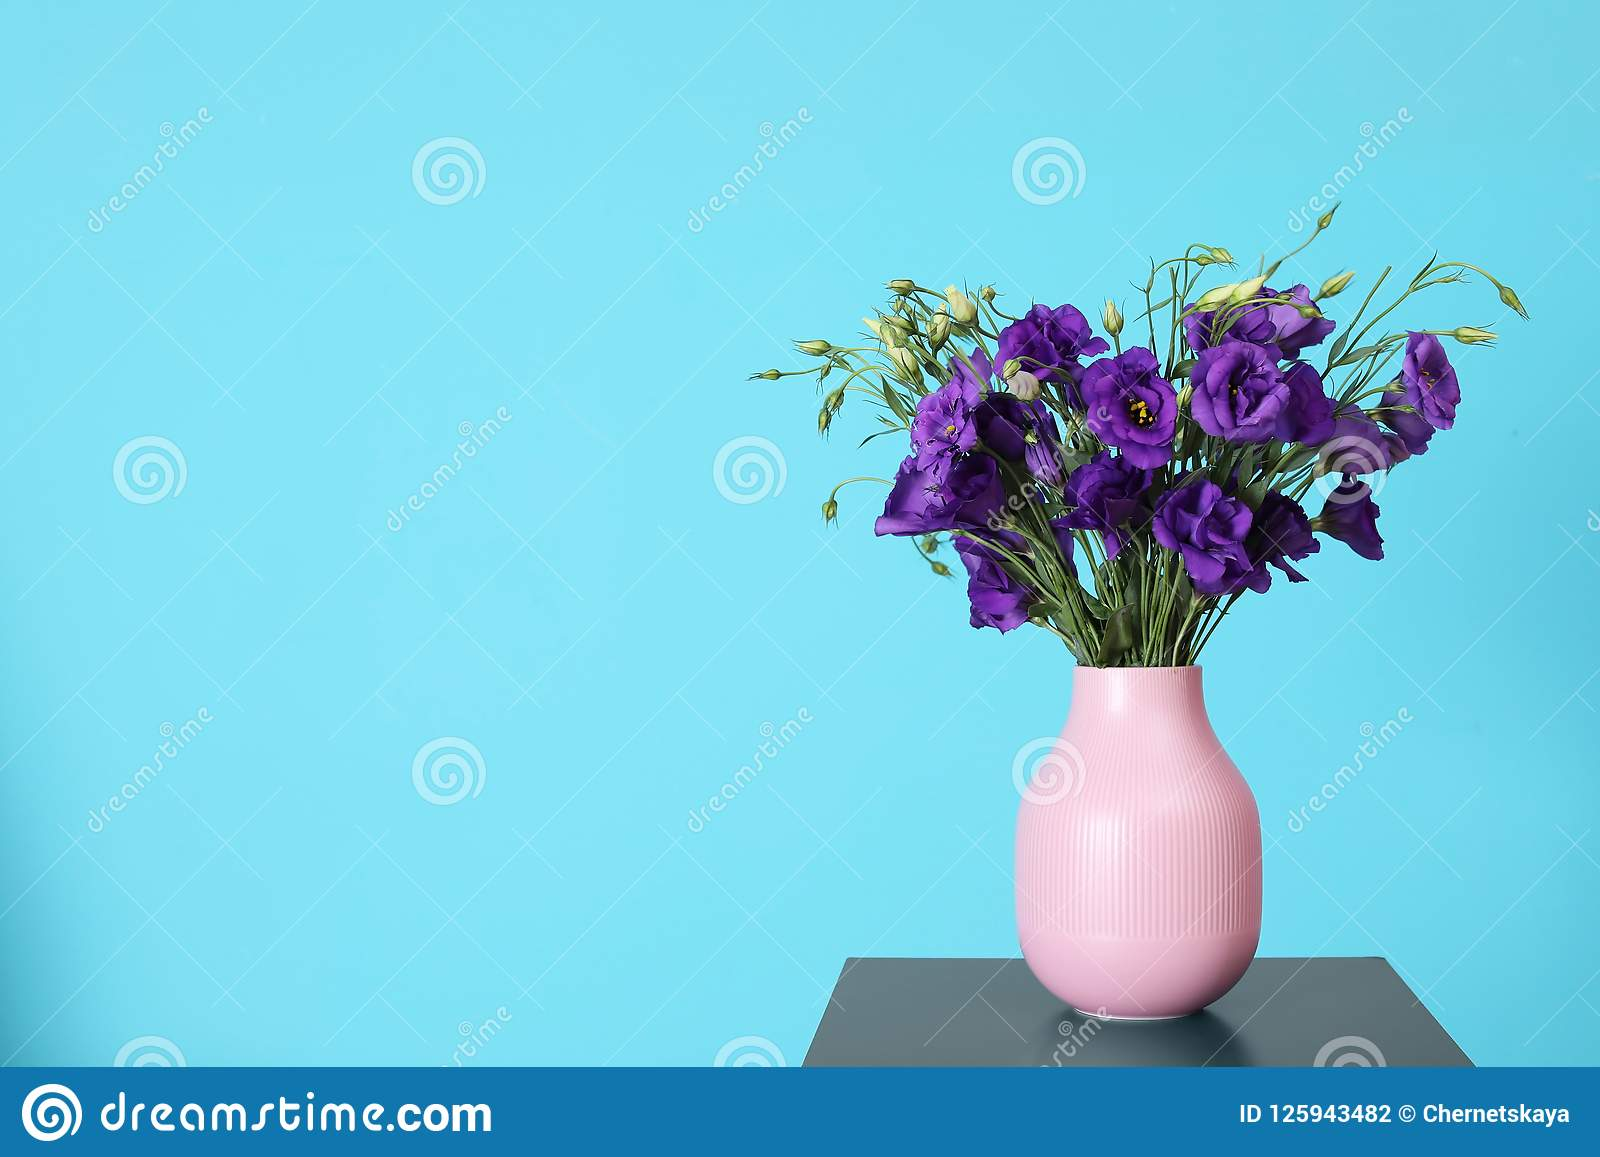 Beautiful bouquet of purple eustoma flowers